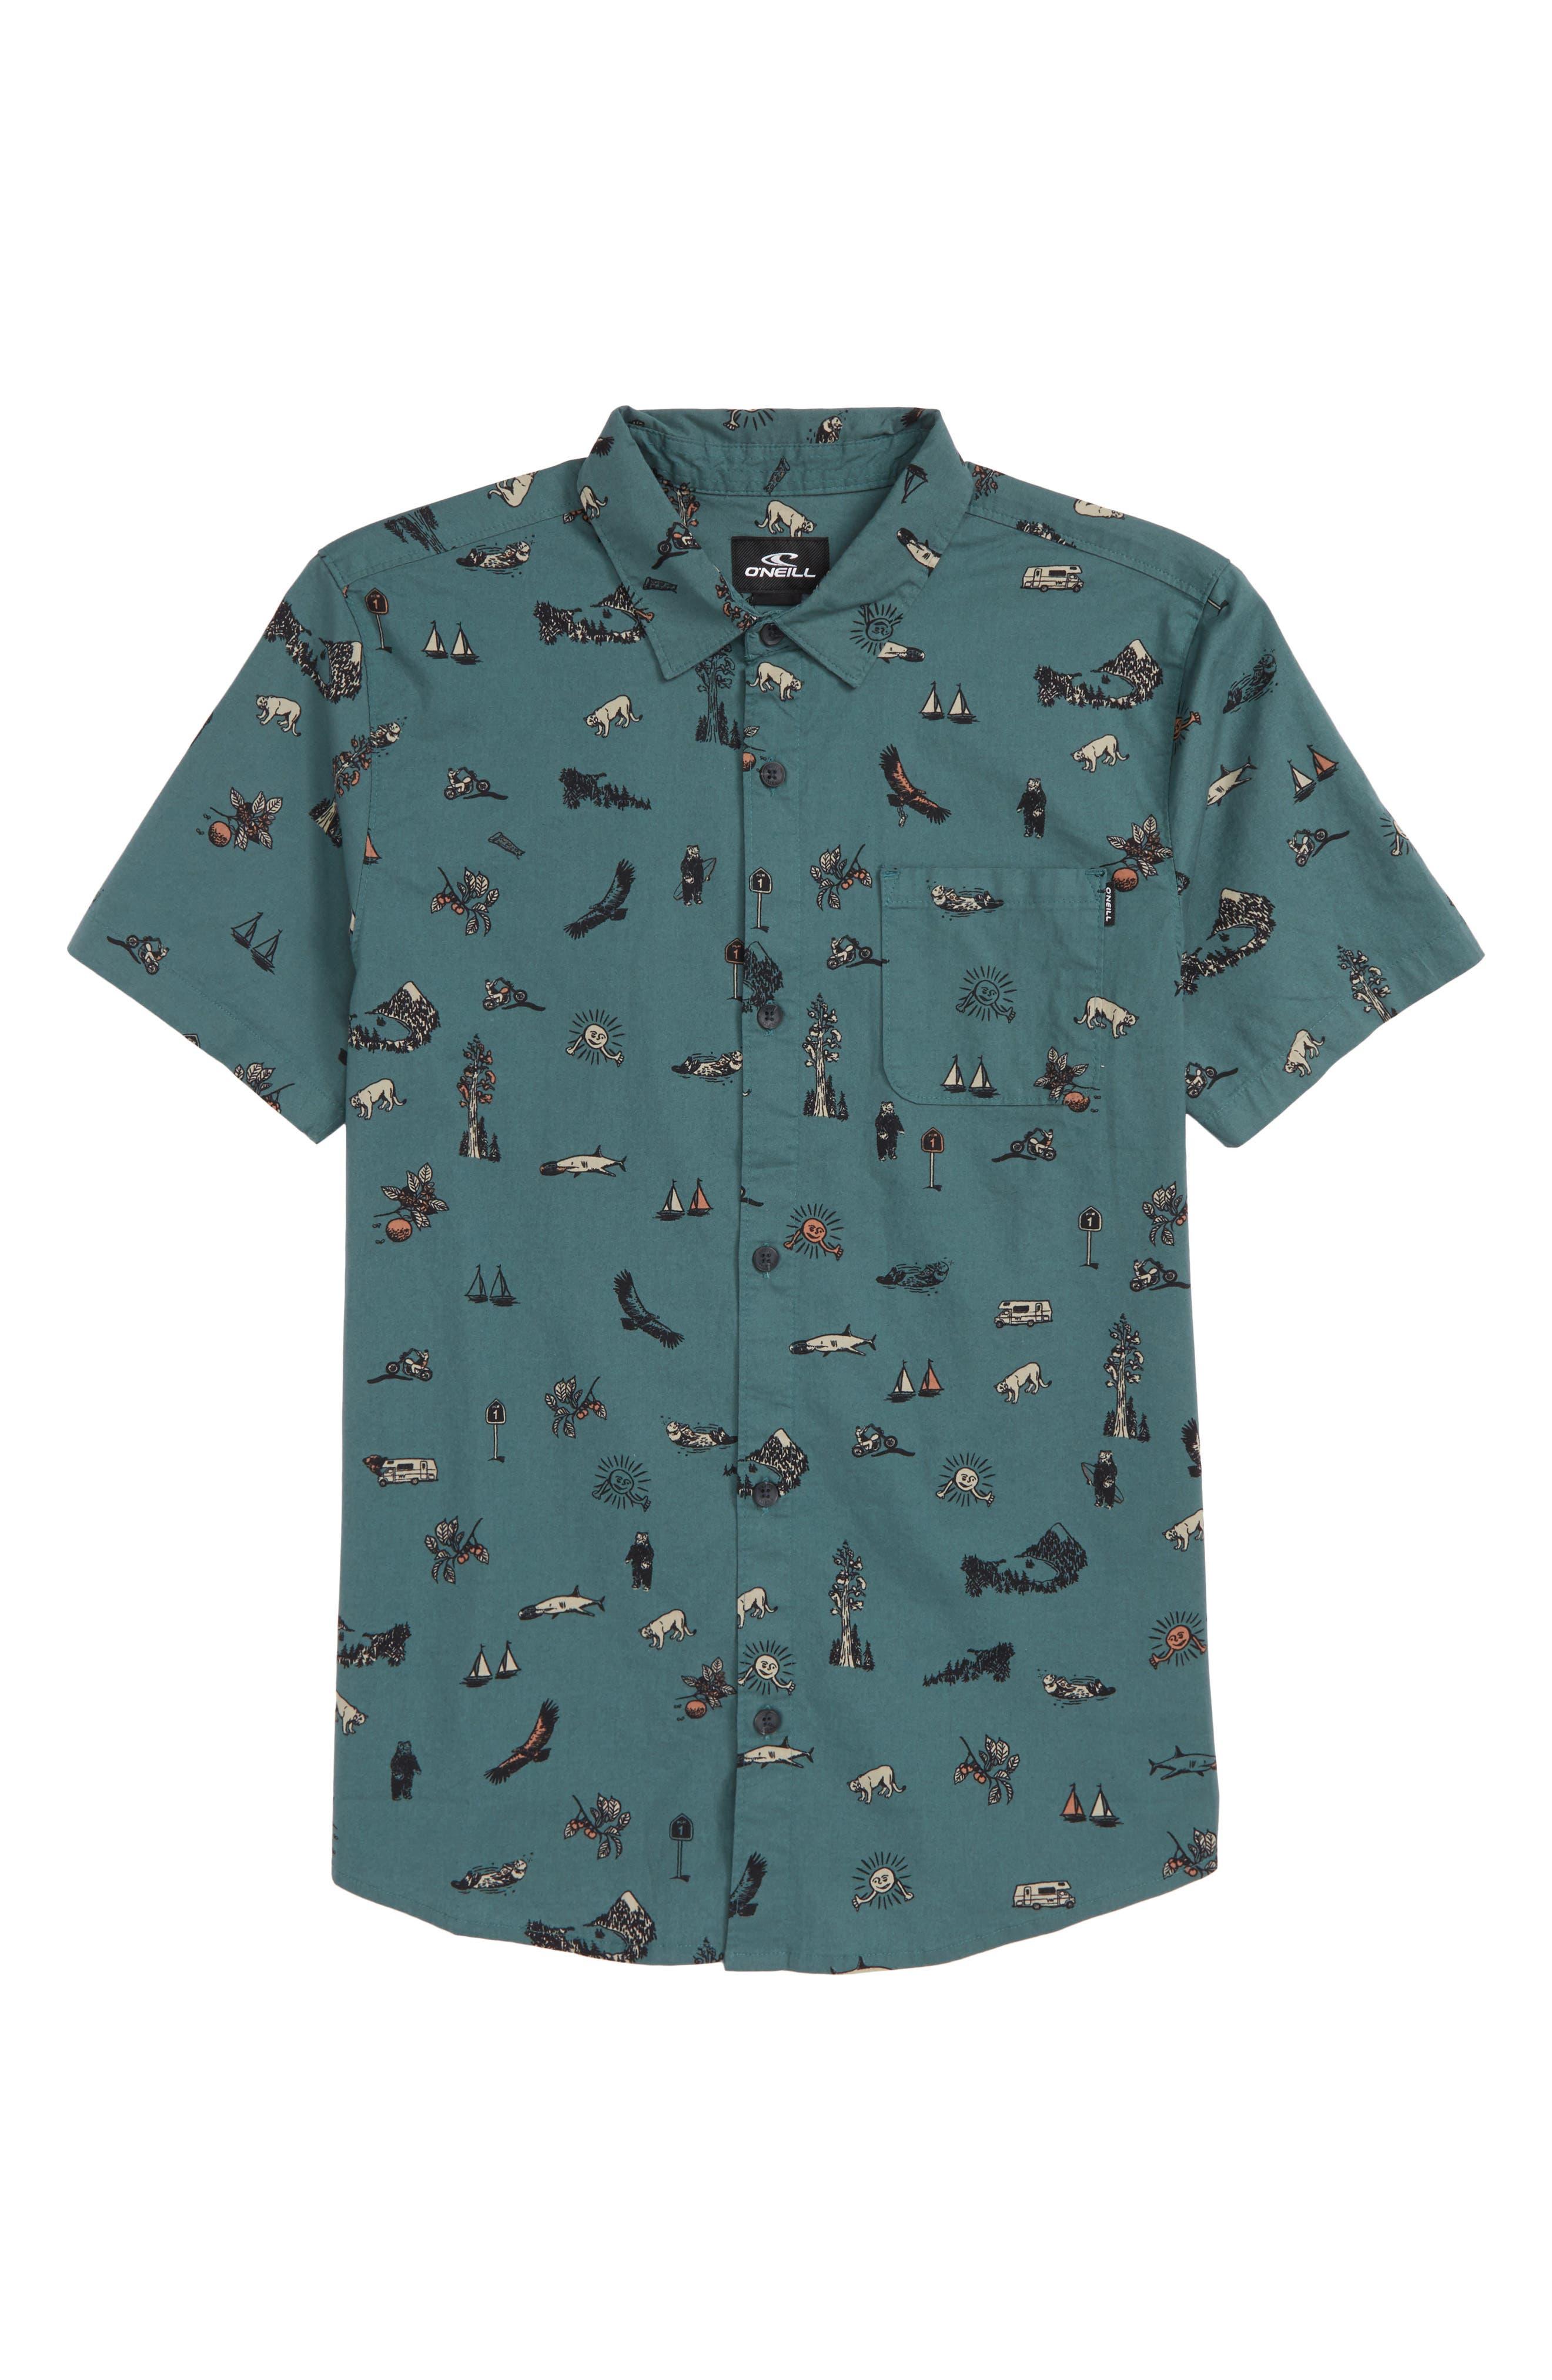 O'Neill Squawker Woven Shirt (Big Boys)